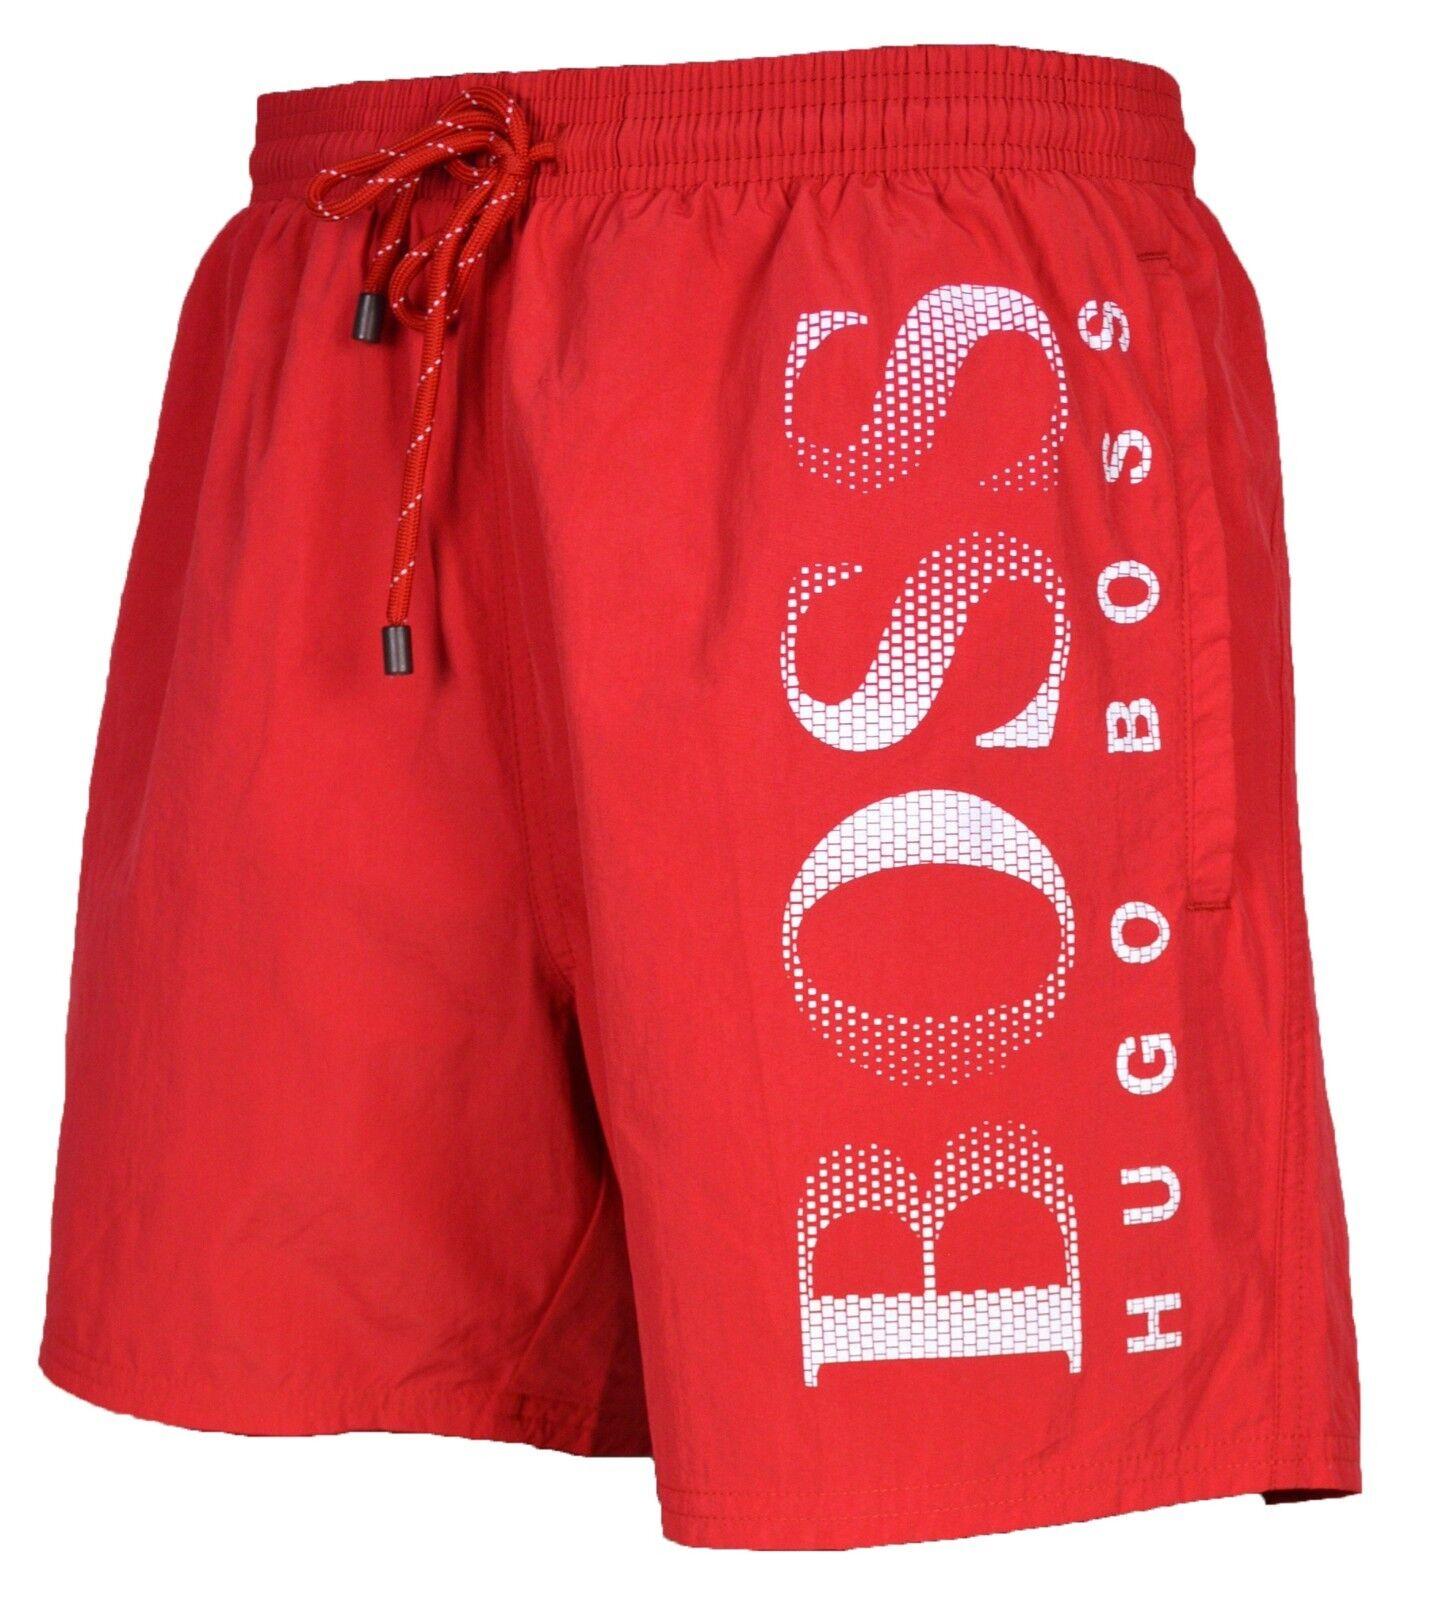 767a64f5b ... Hugo Boss Men`s Octopus Swim Shorts Shorts Shorts - 50371268 4bec43 ...